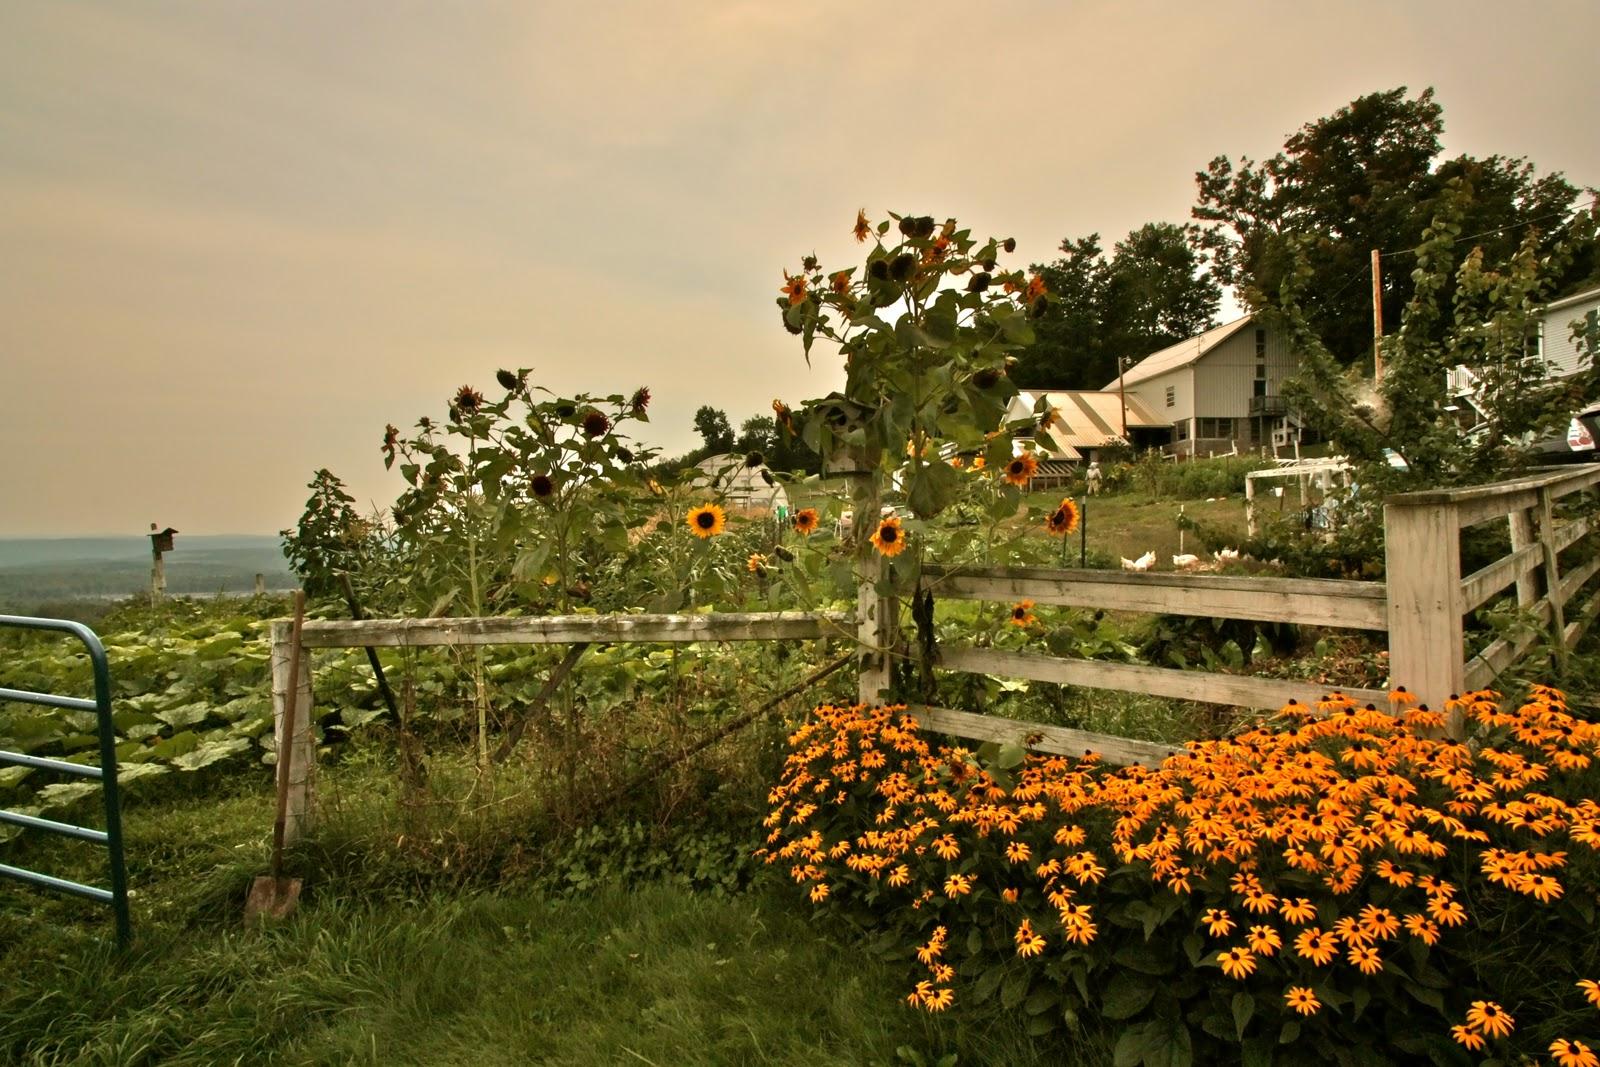 berryfields-farm-view.JPG